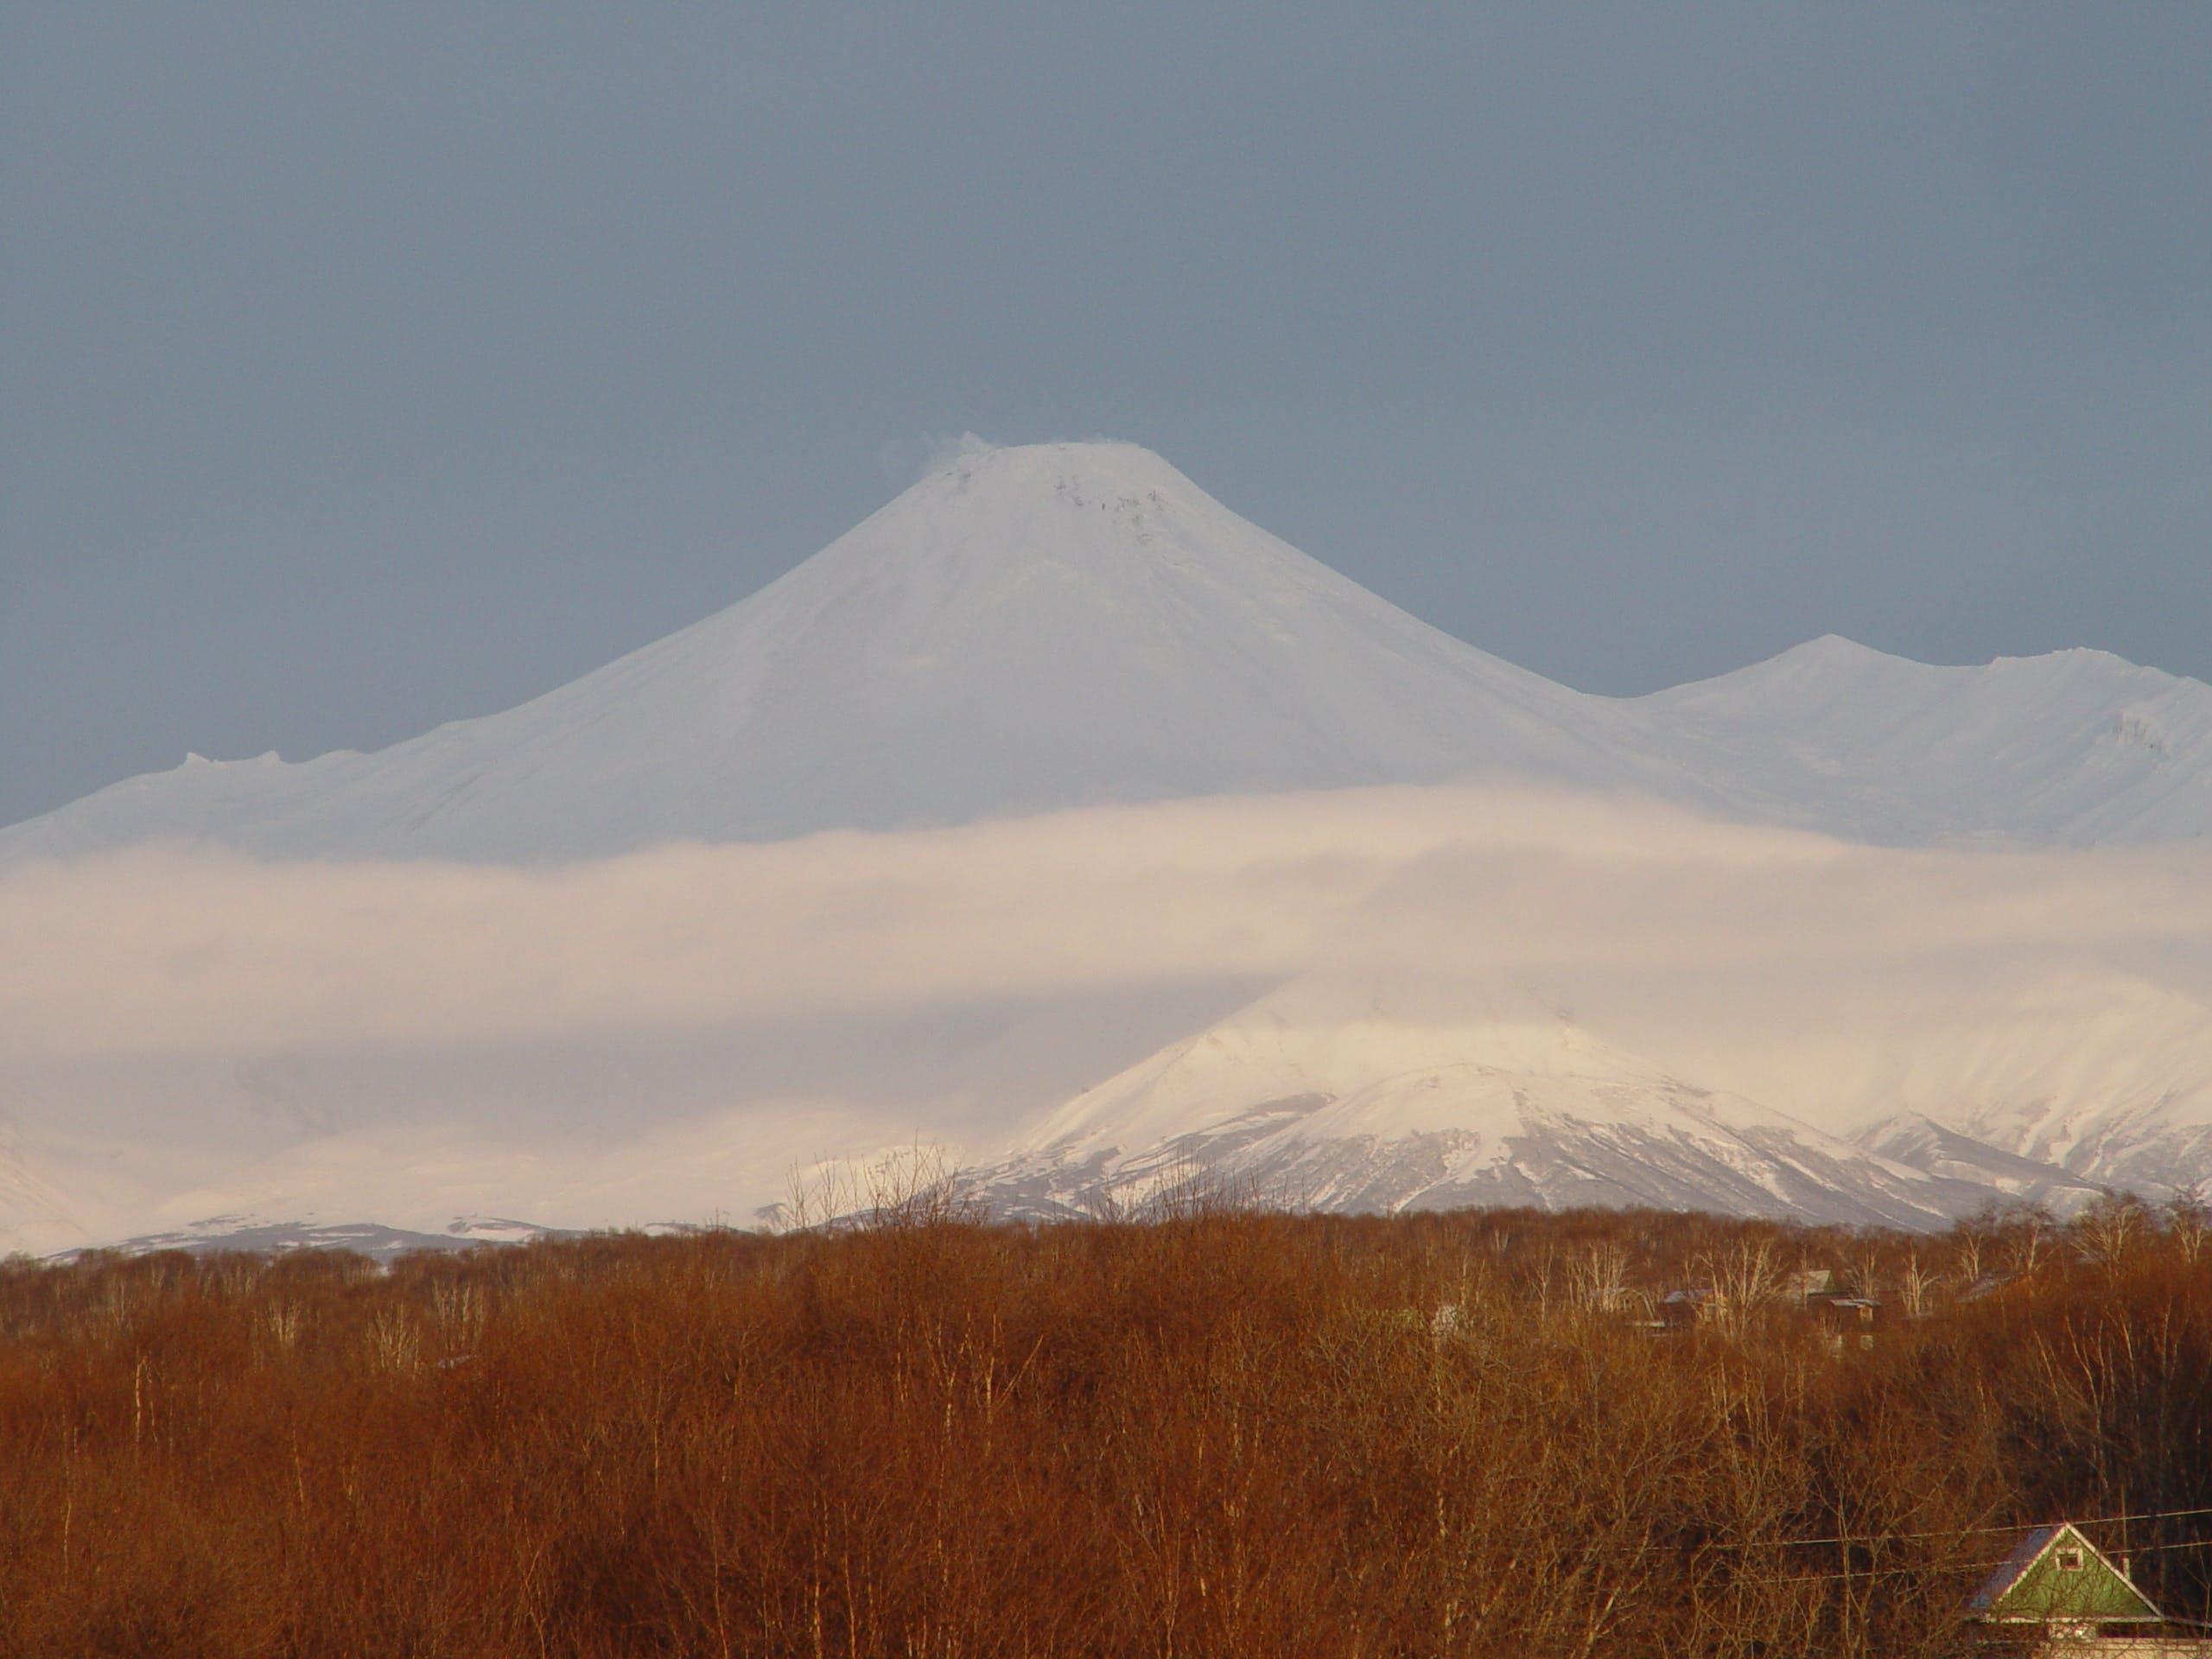 Free stock photo of View of the volcanoes of Petropavlovsk Kamchatsky